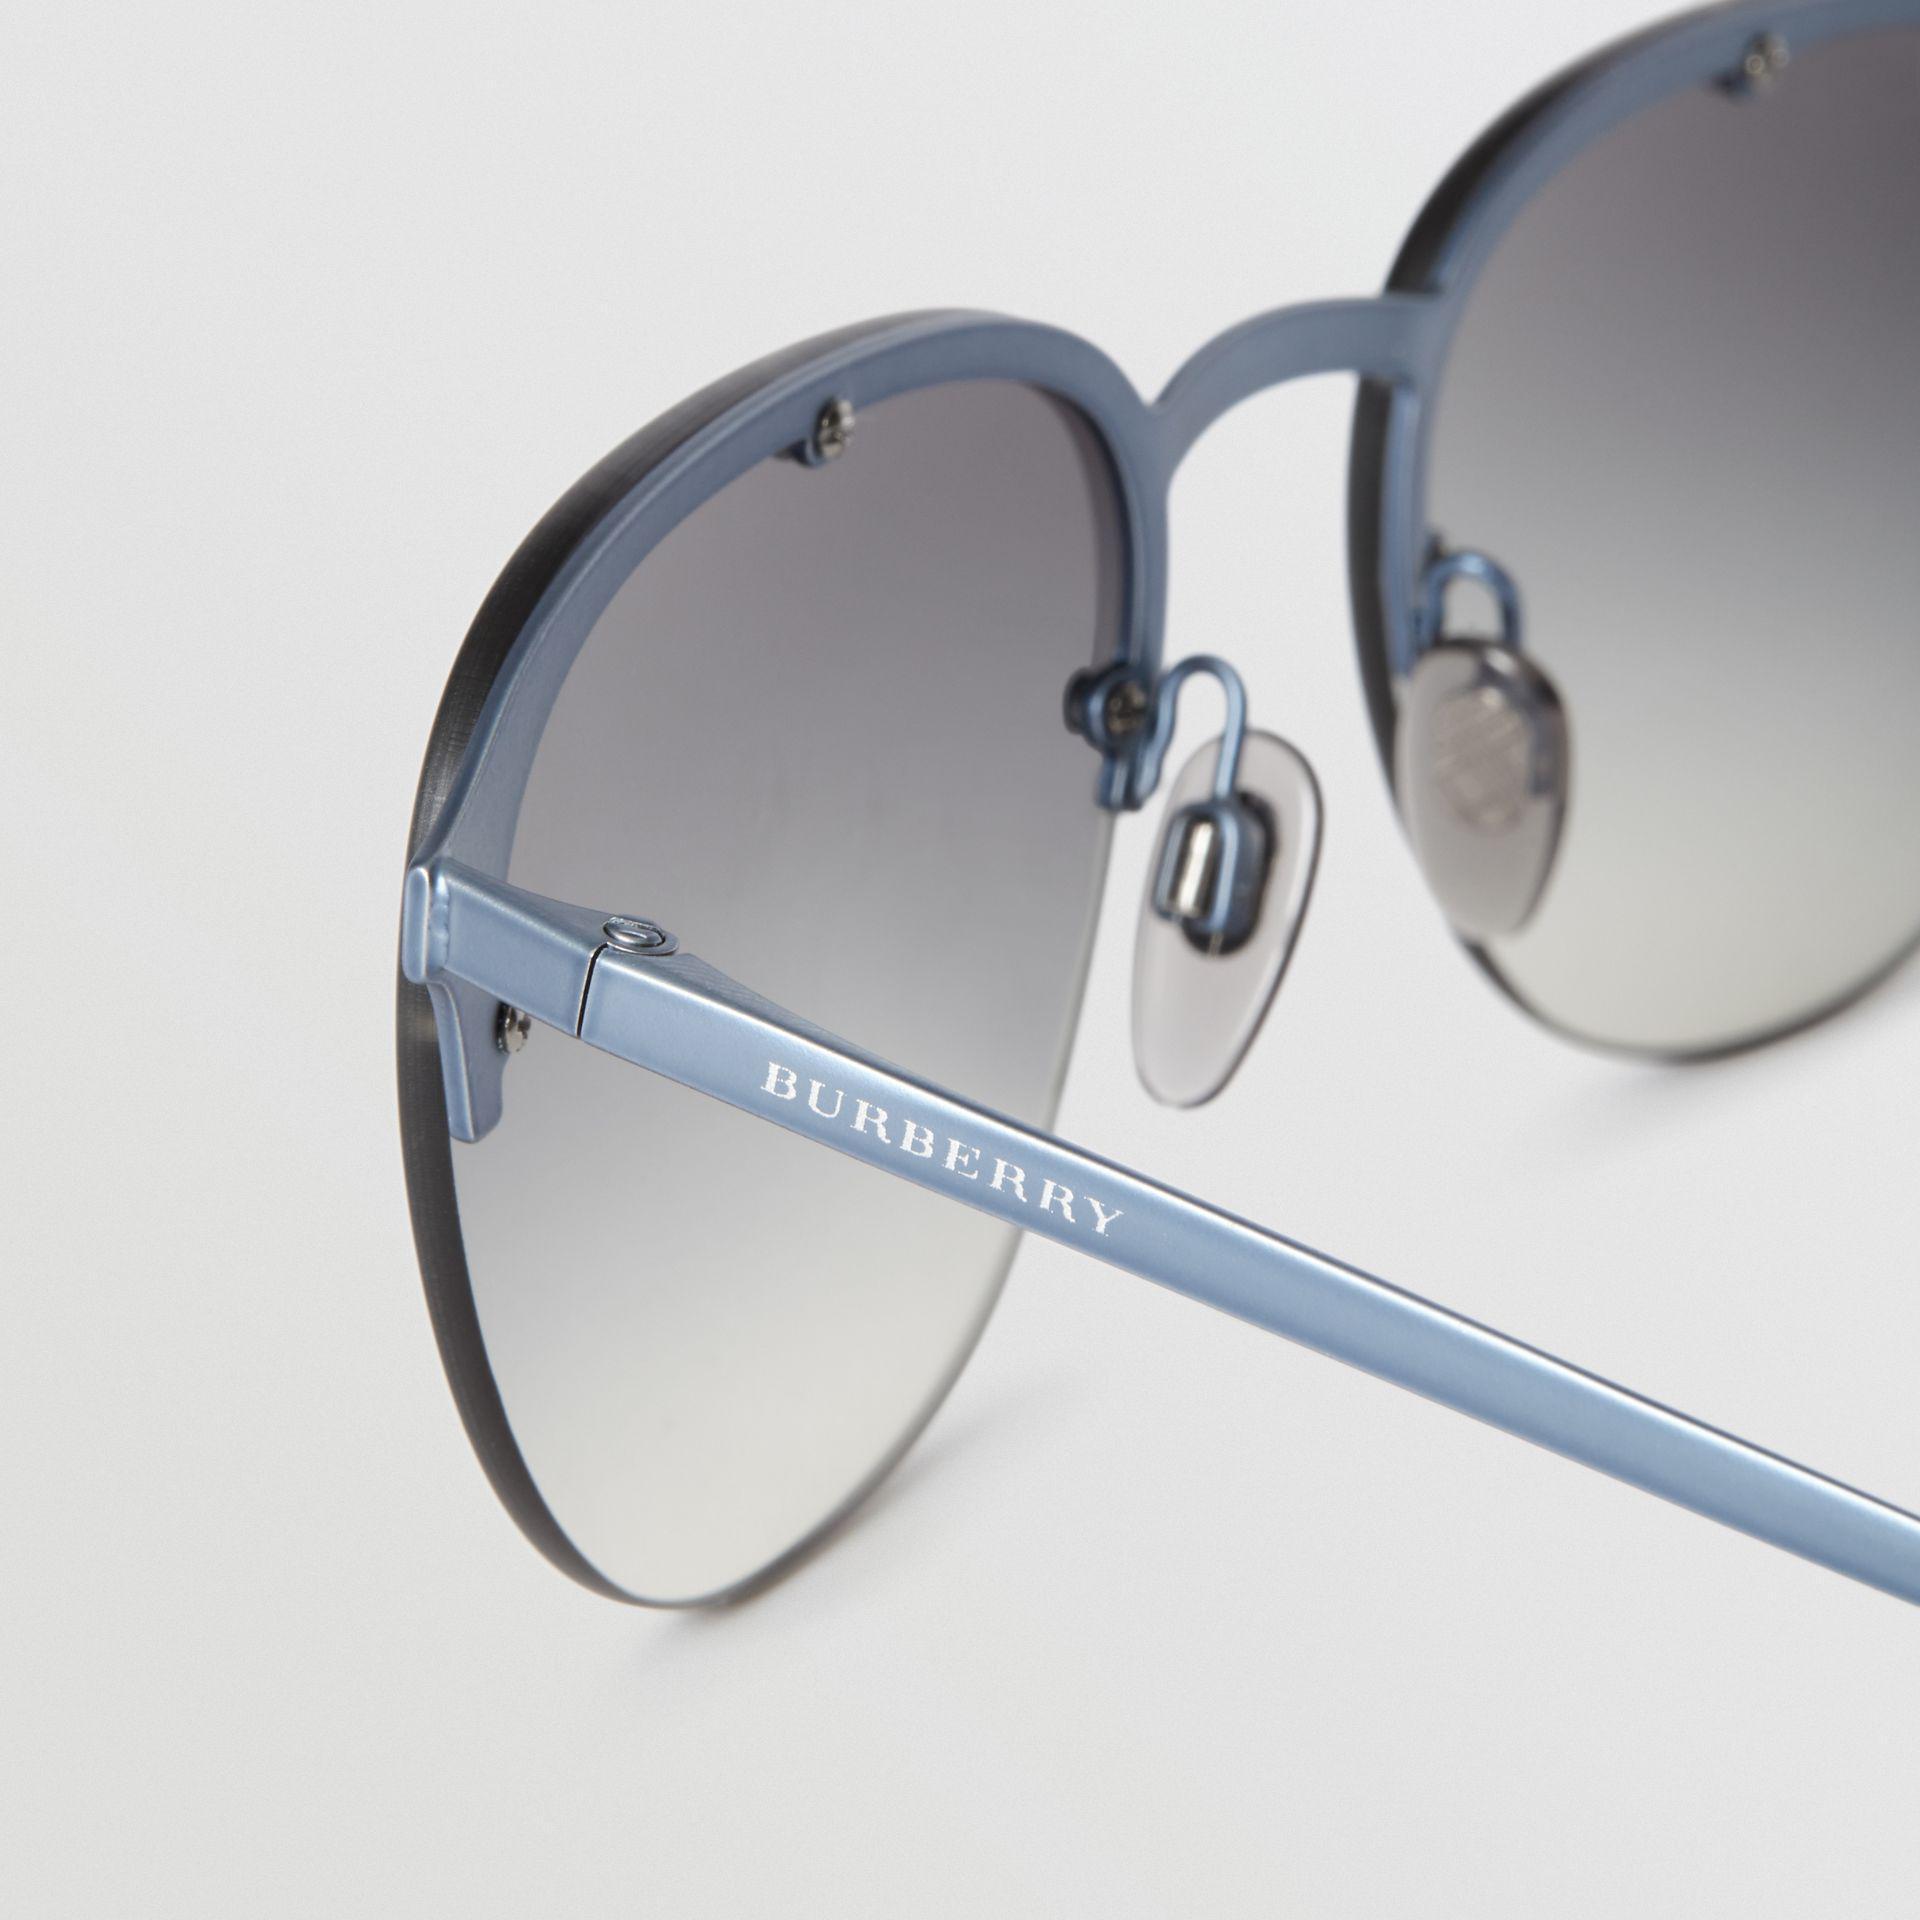 2acf5e3038d Burberry - Gray Round Frame Sunglasses for Men - Lyst. View fullscreen